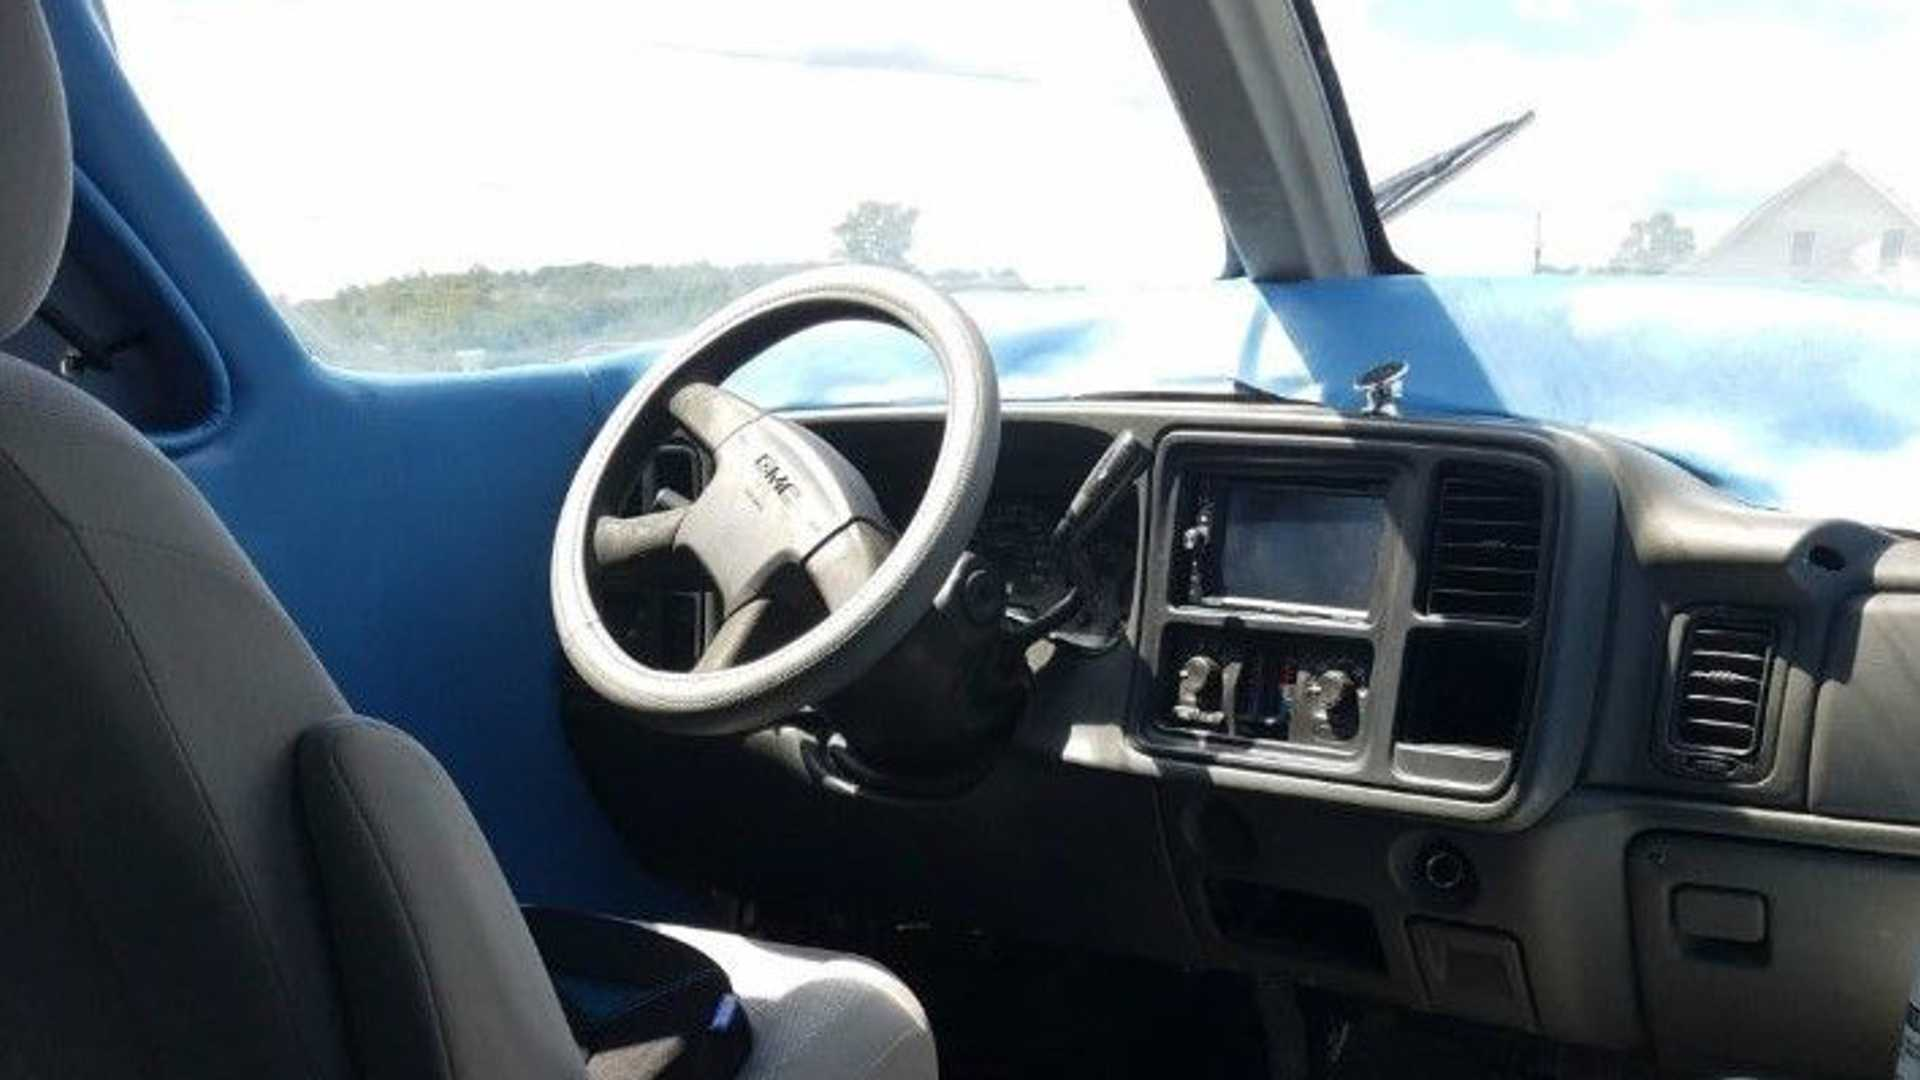 doc-dao-limousine-nua-may-bay-nua-xe-cuc-ky-la-mat